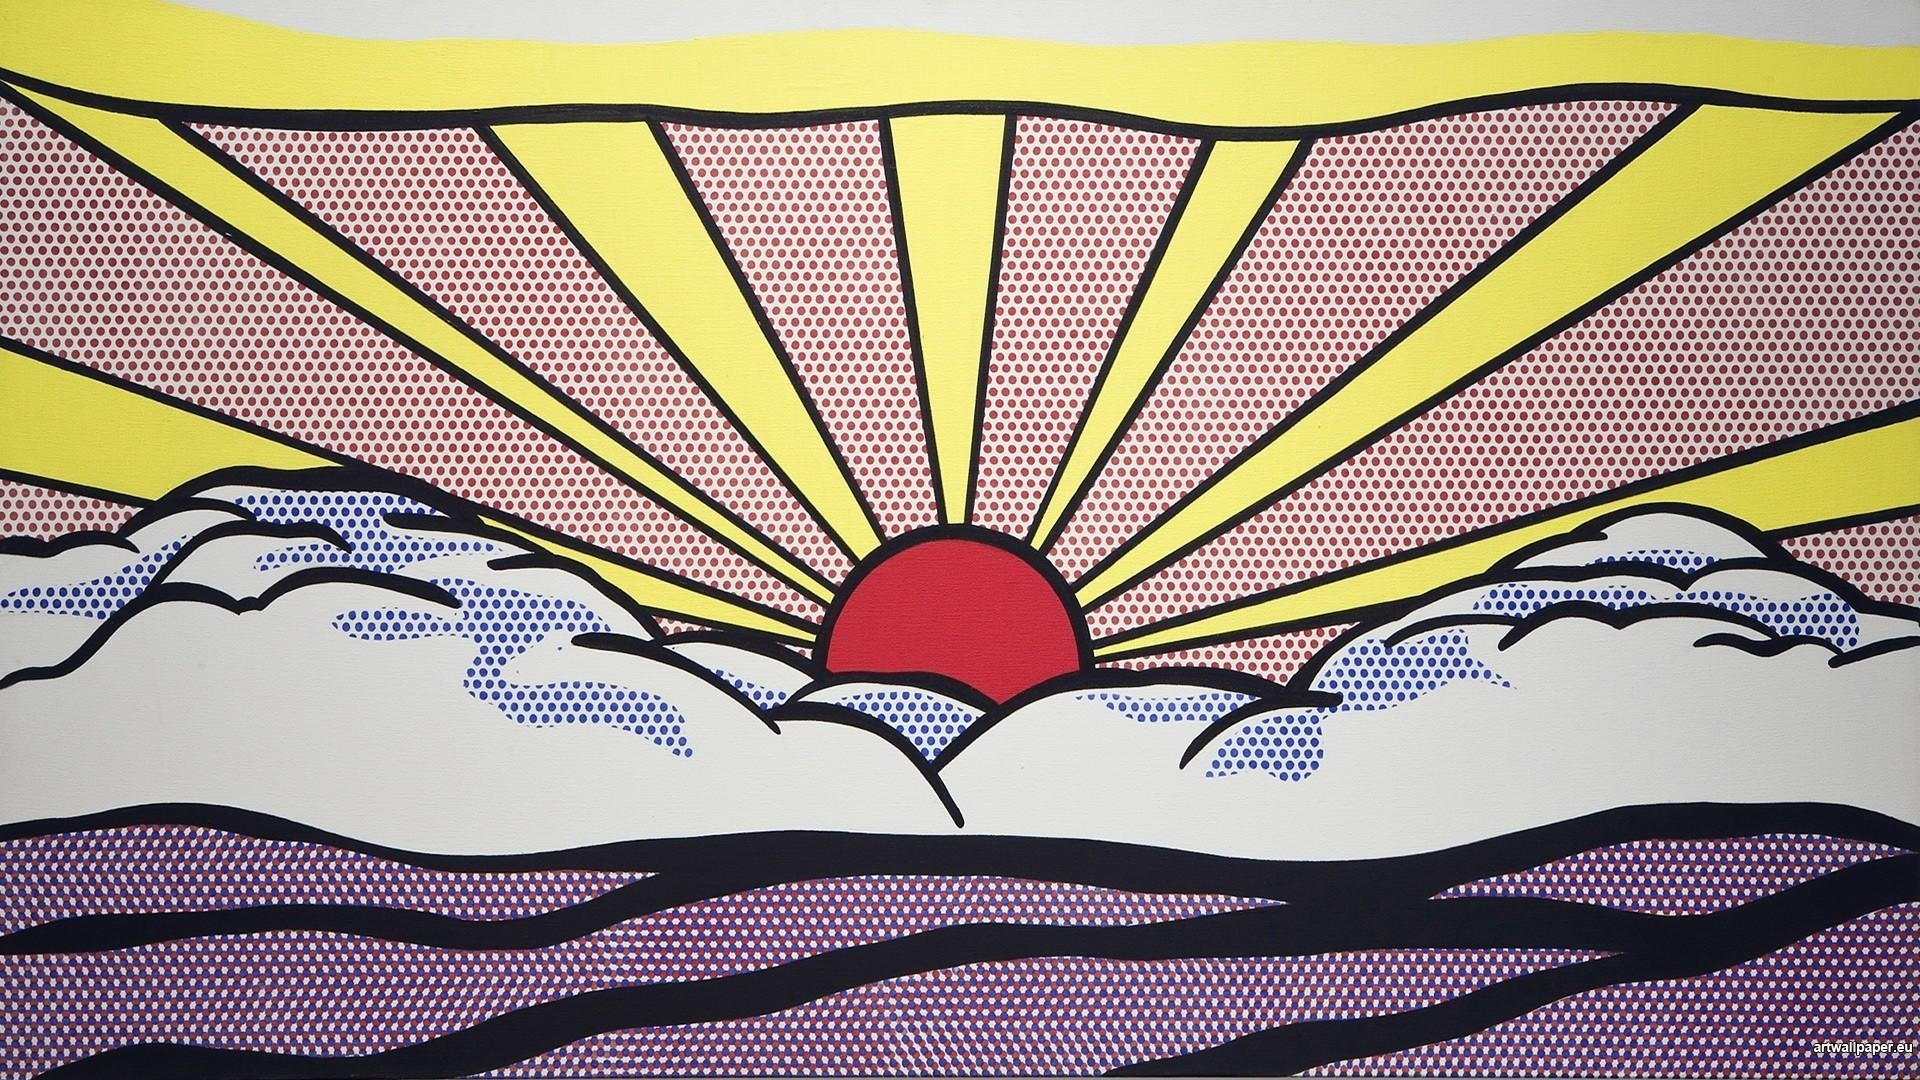 roy lichtenstein artwork paintings pop art sunrise wallpaper | (87626)